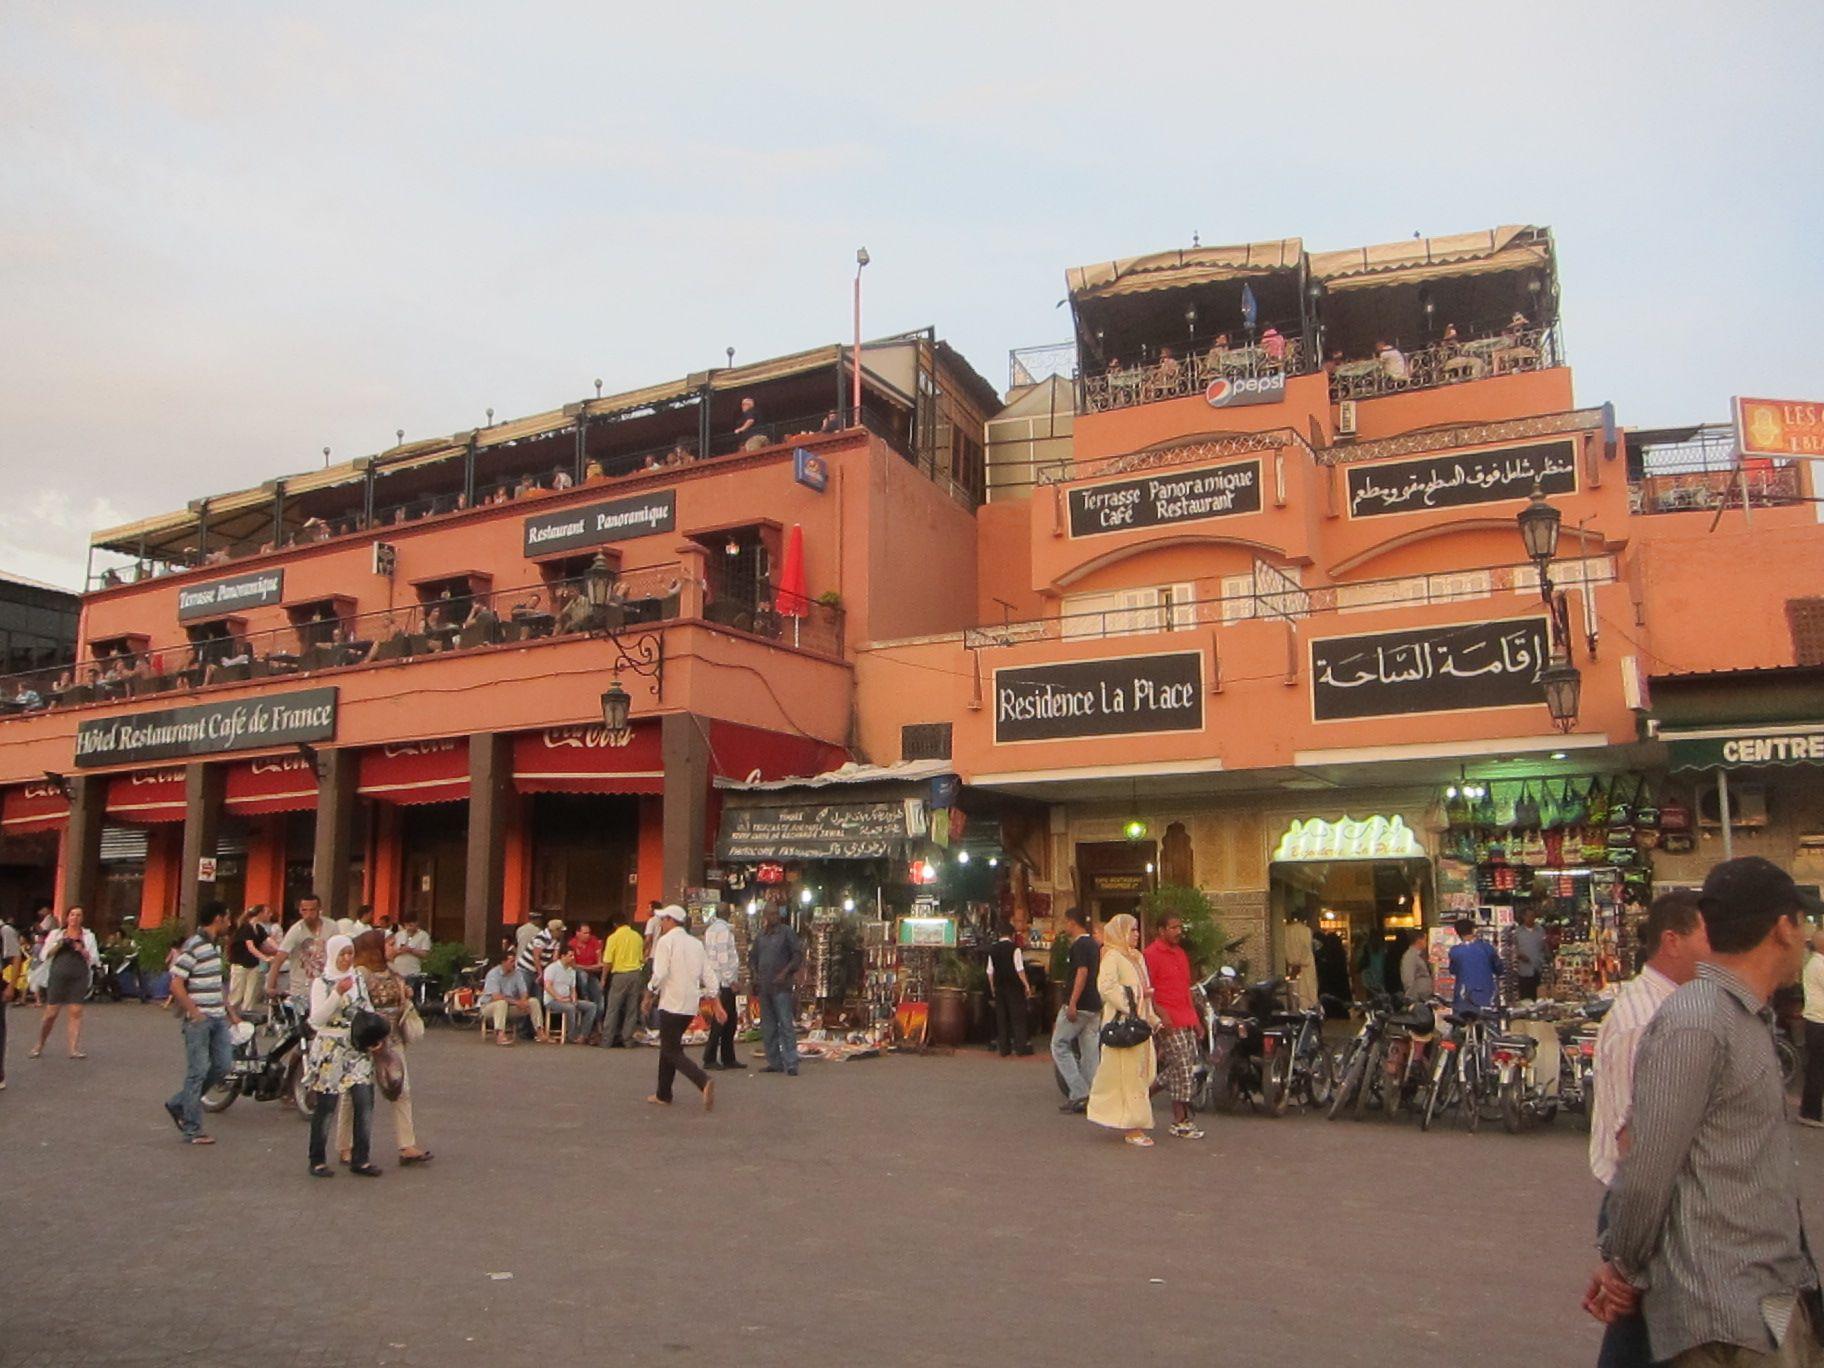 The Famous Cafe De France Lines Jemaa El Fna Square In